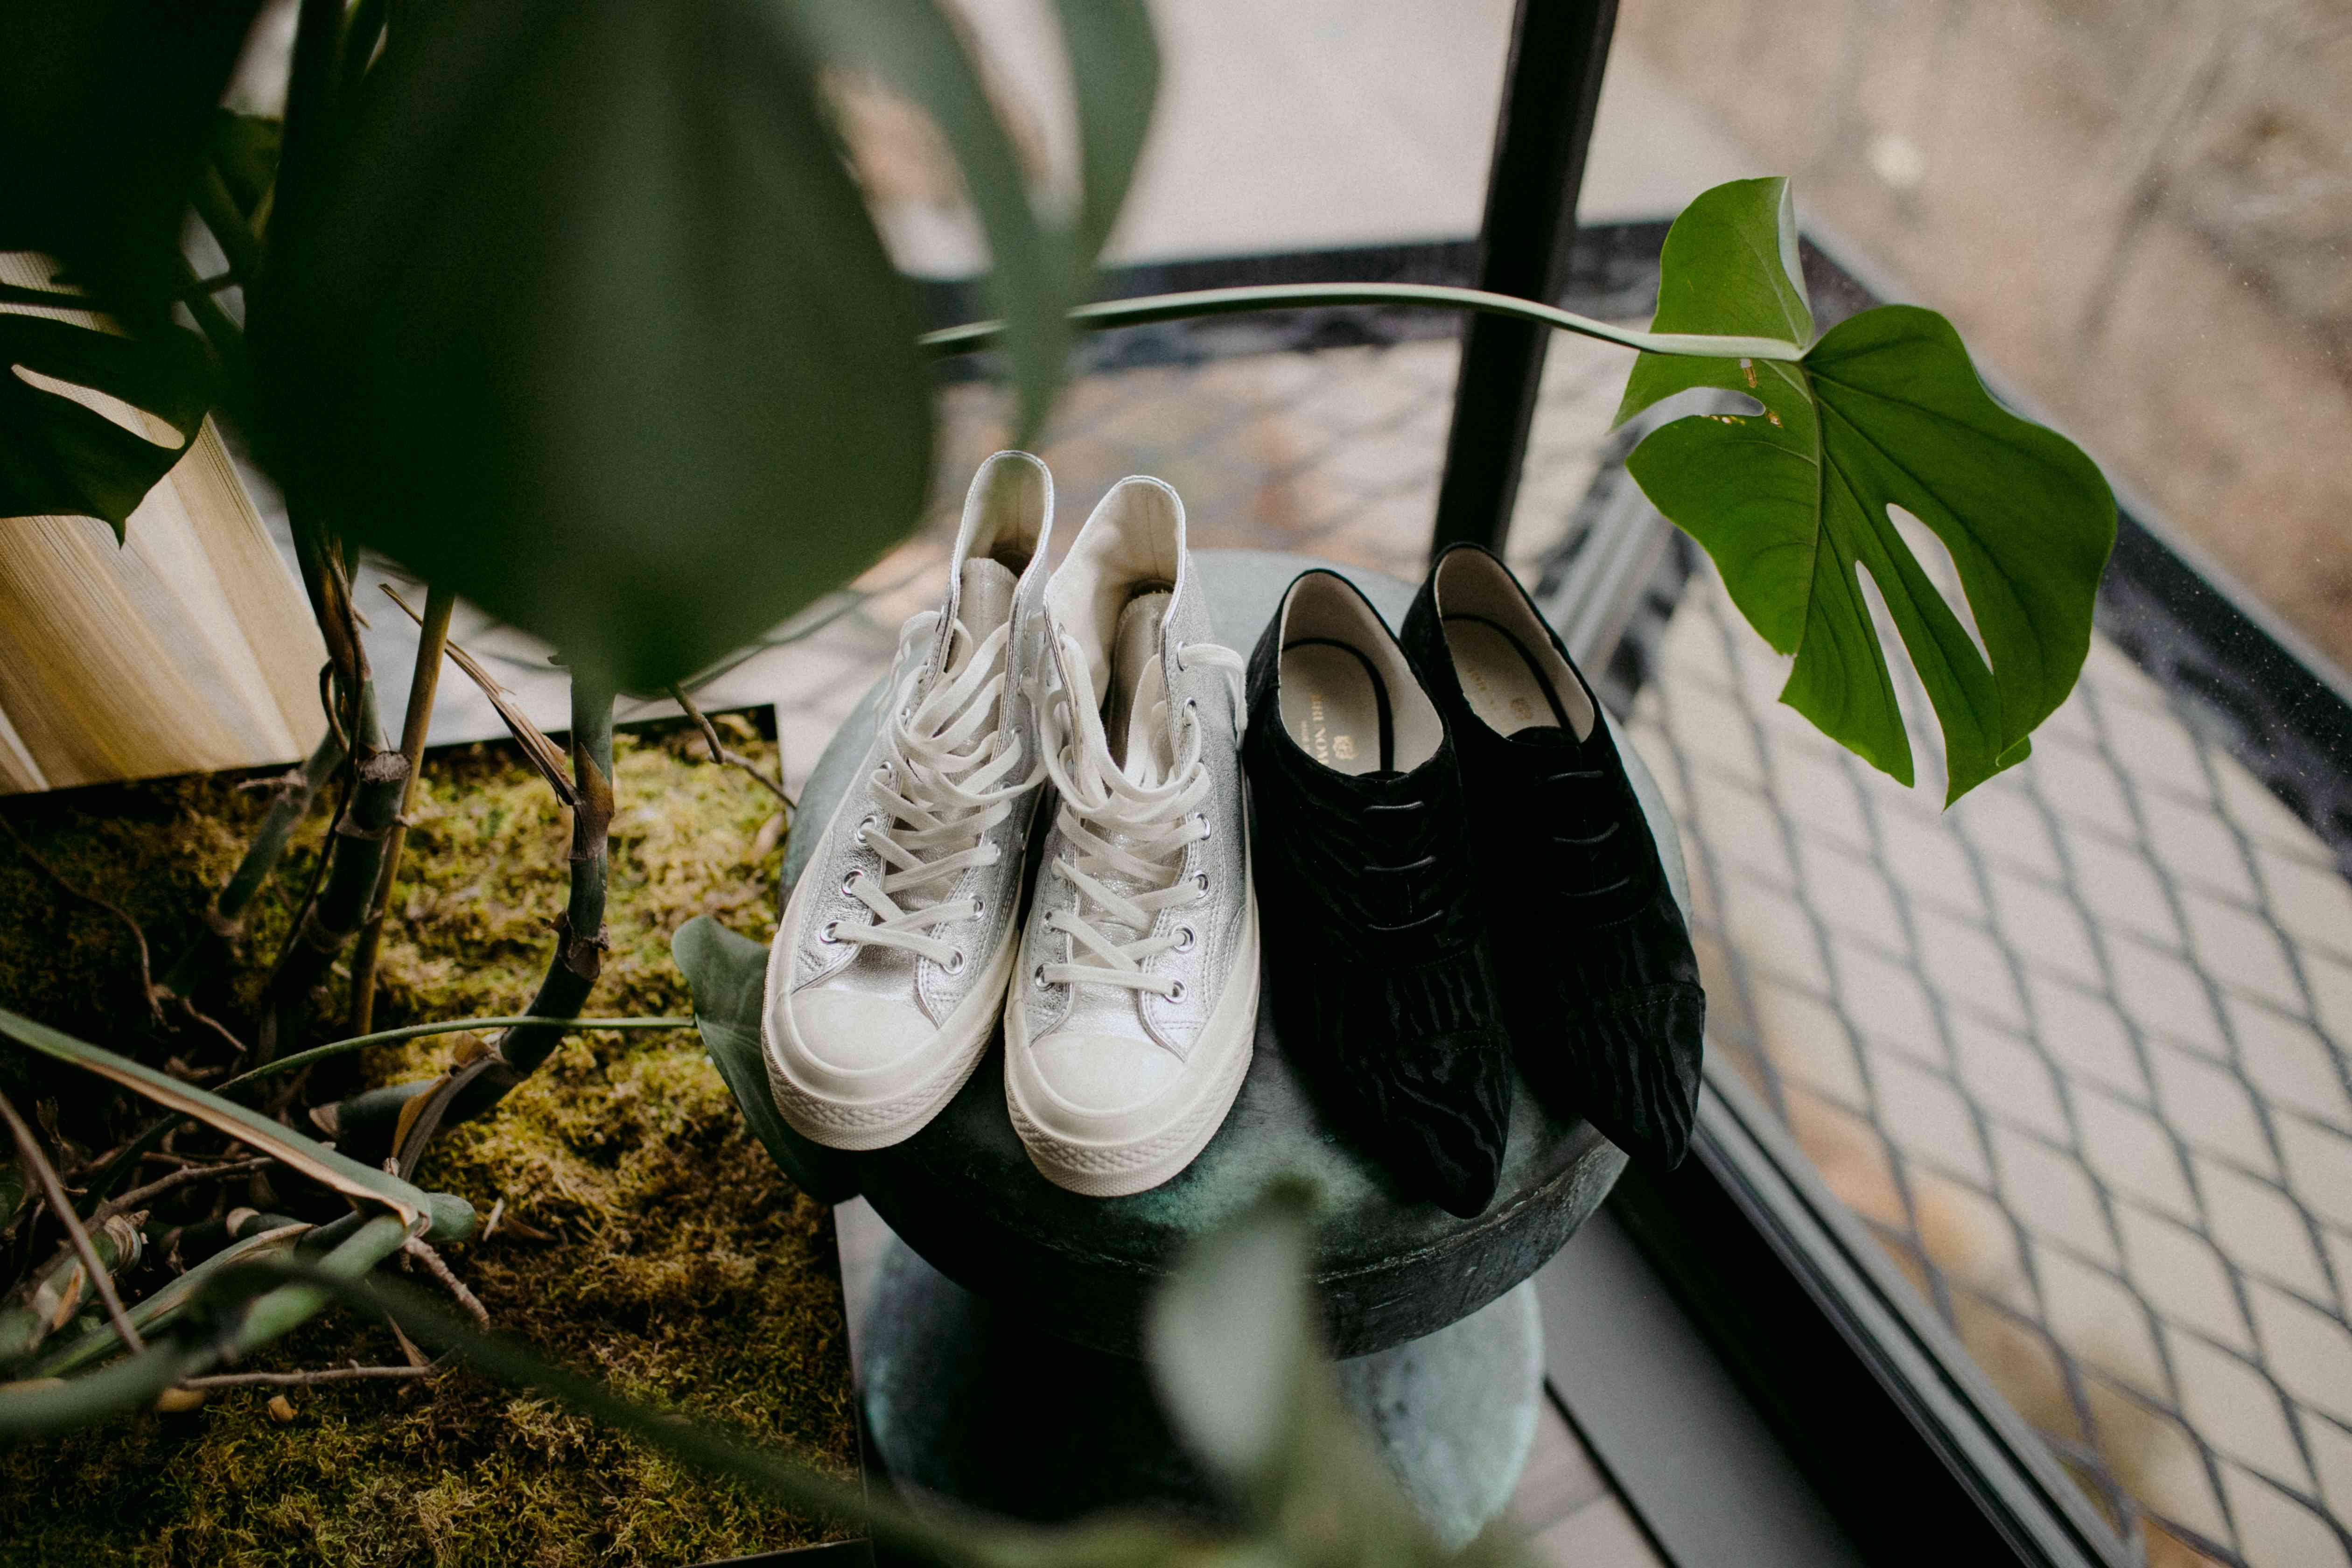 The brides' wedding shoes